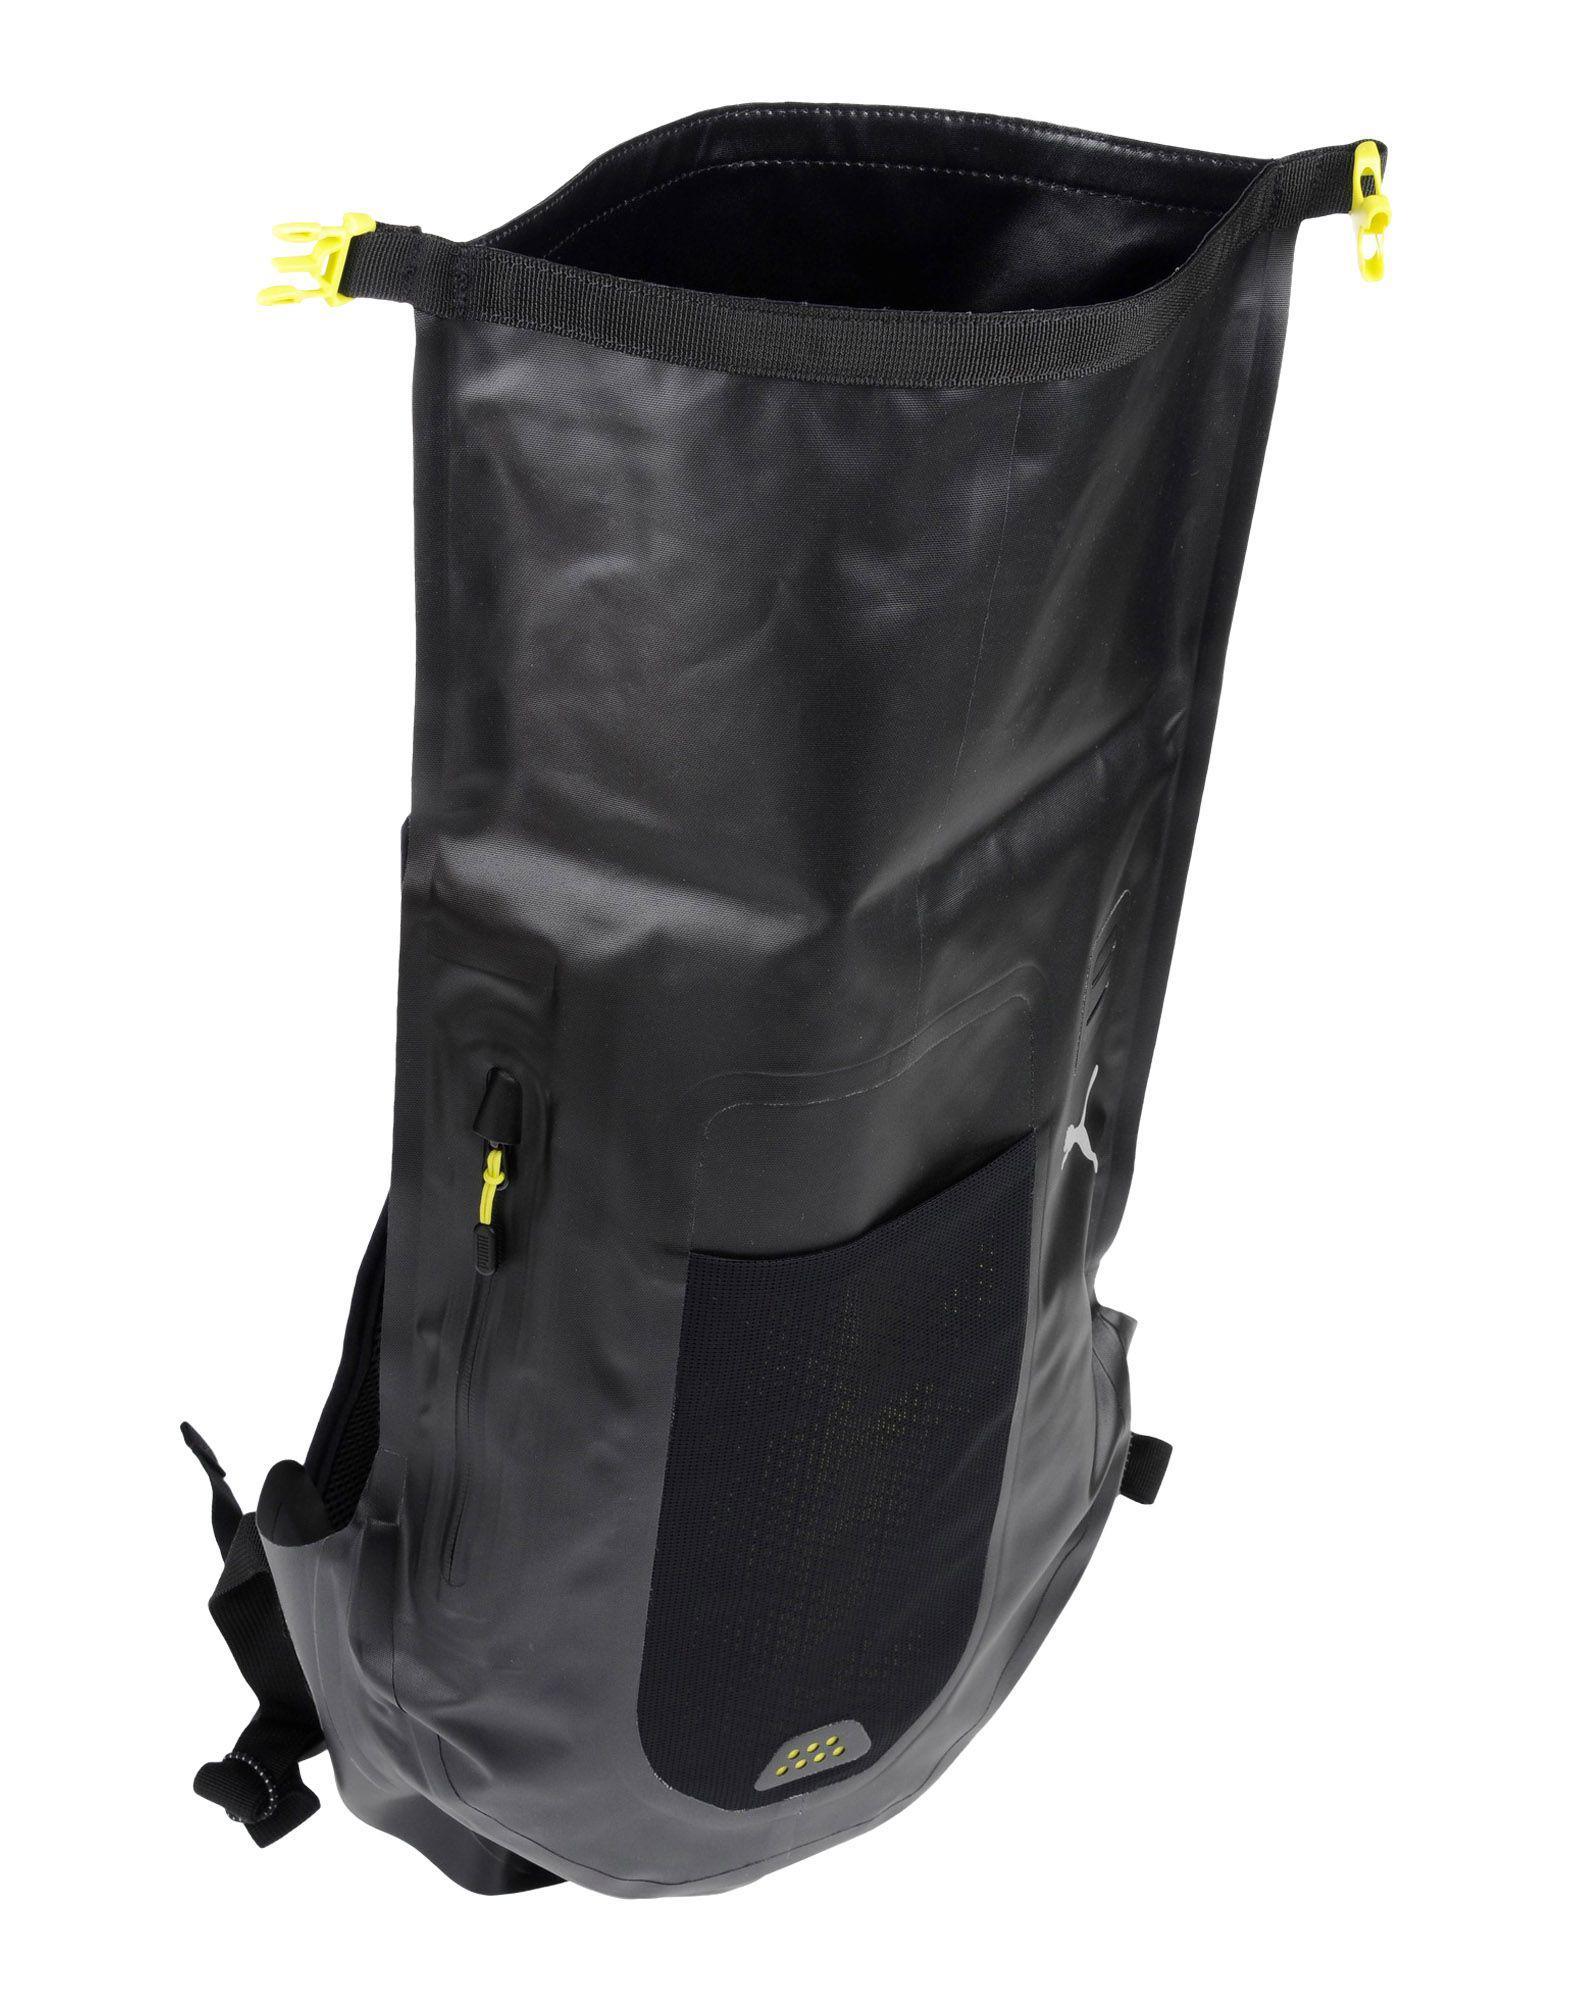 Lyst - PUMA Backpacks   Fanny Packs in Black eb175ff1dfd6f